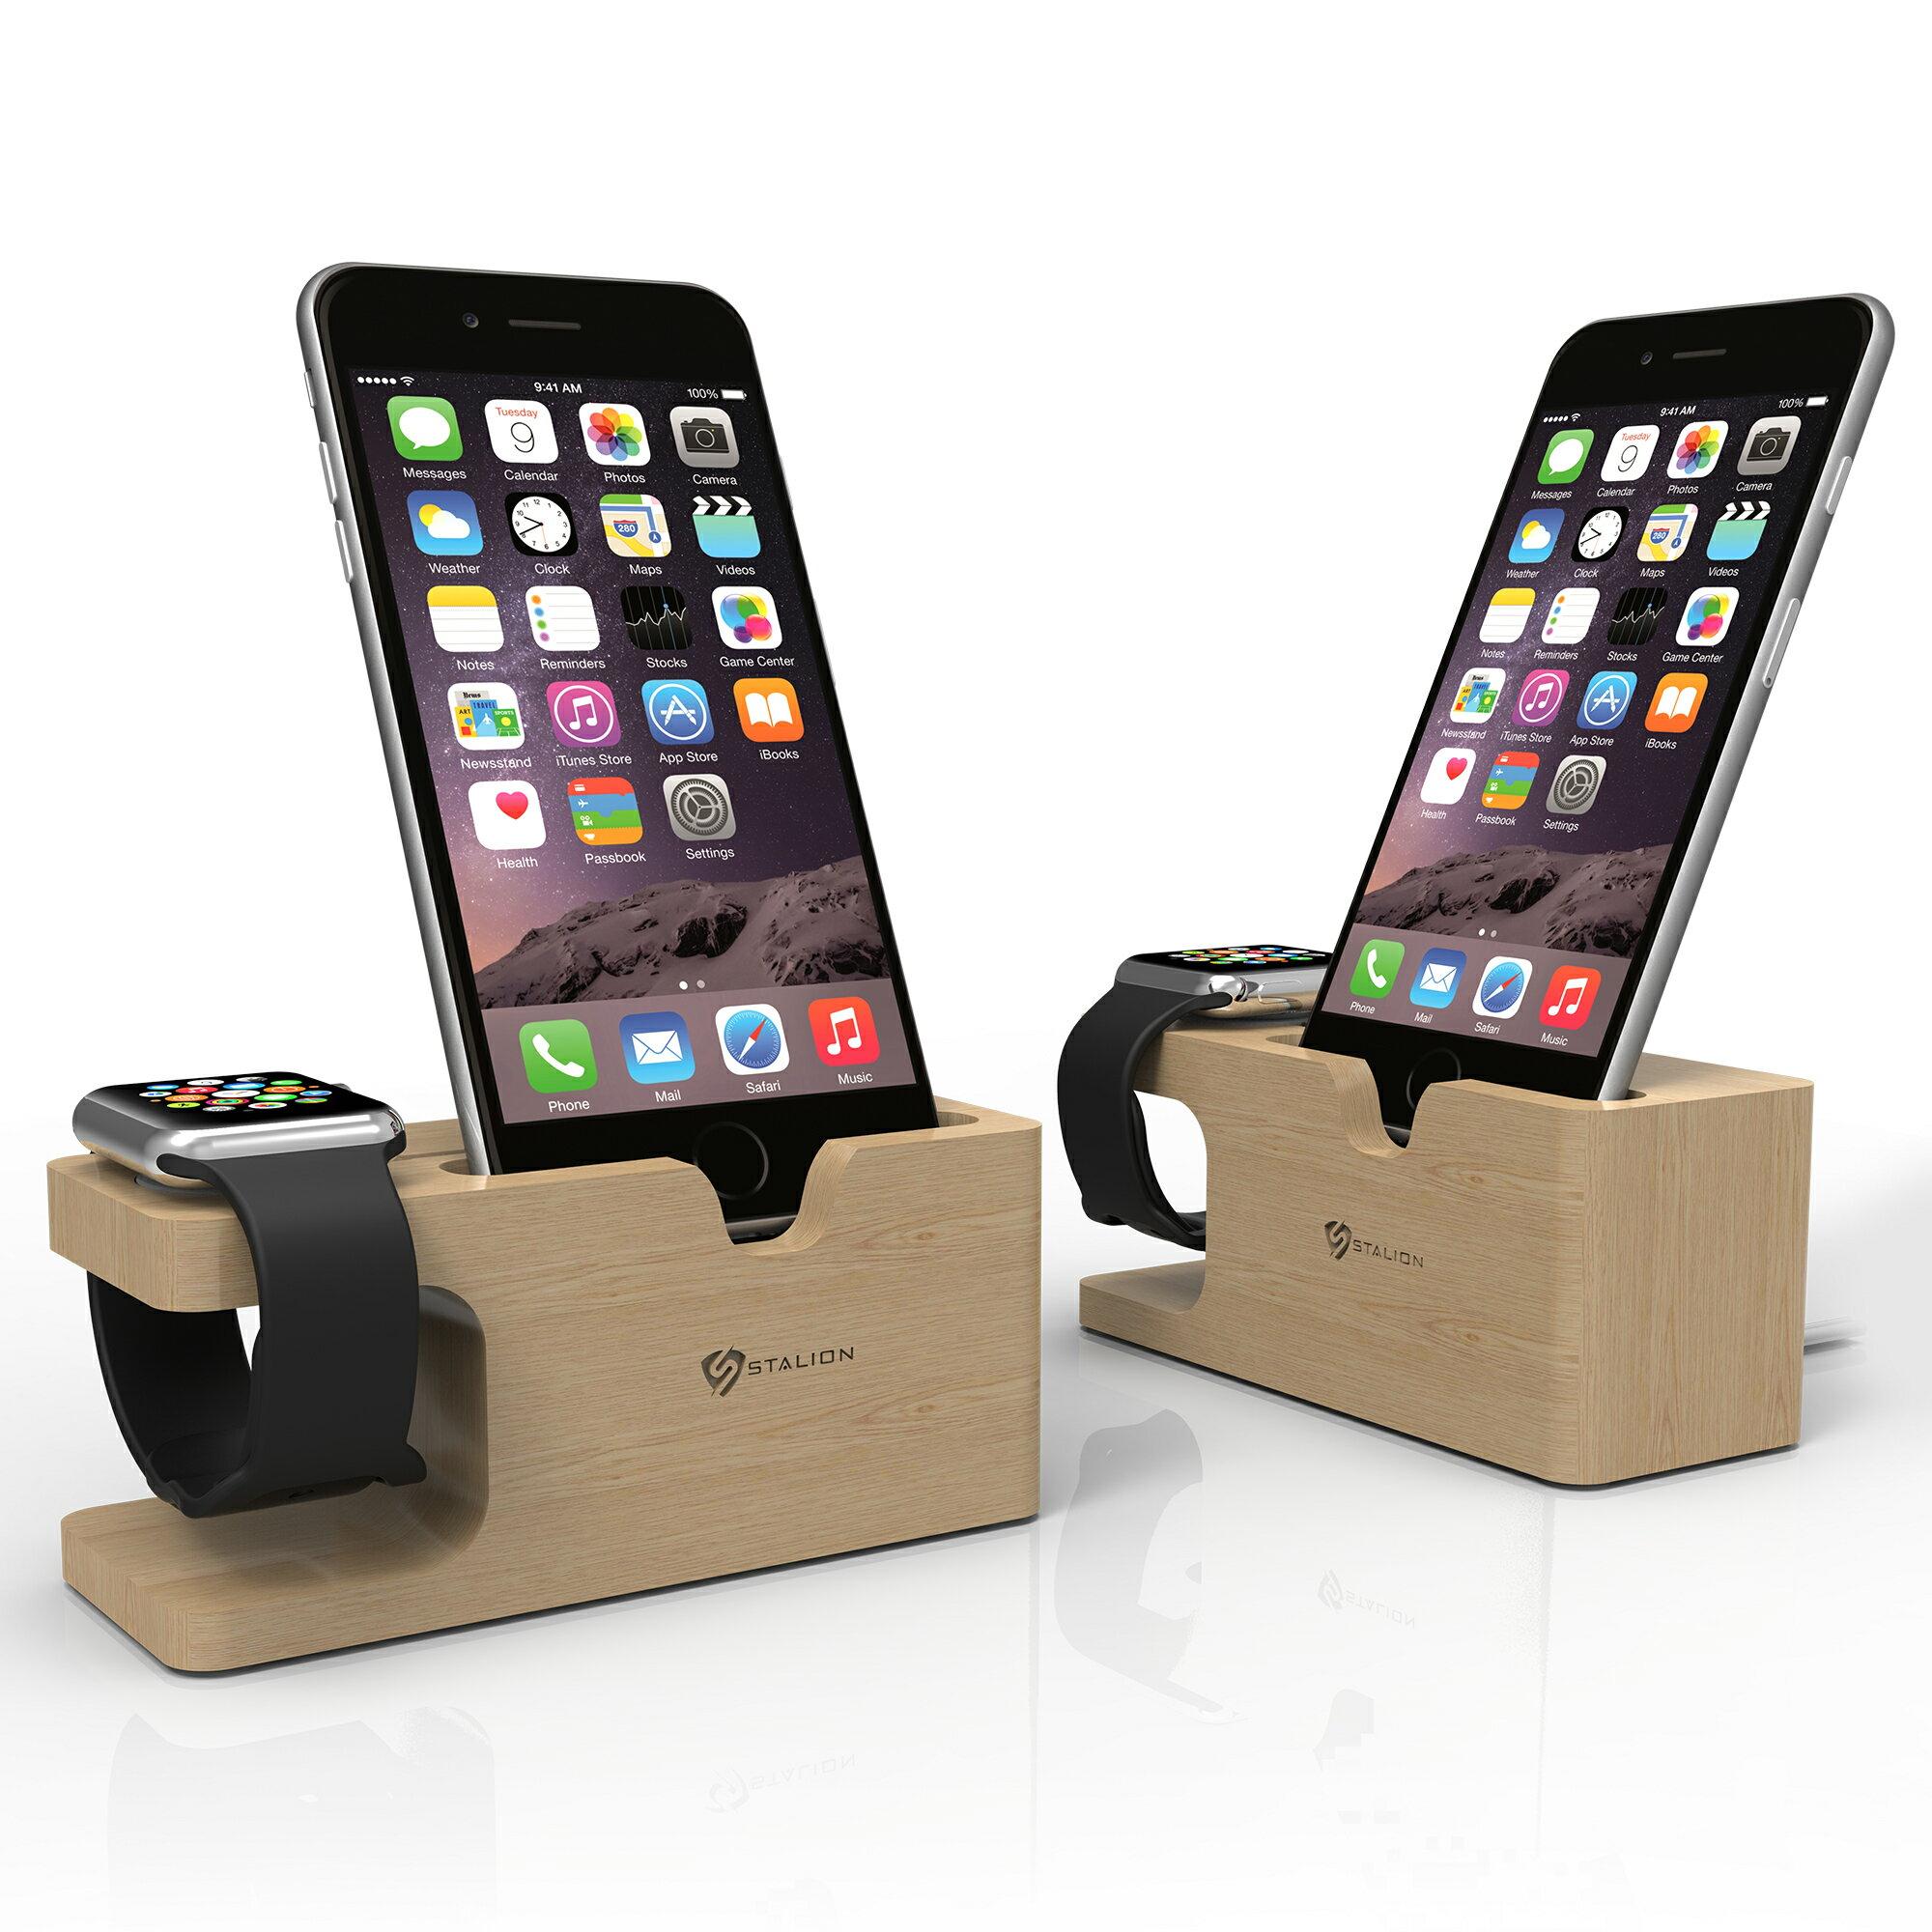 huge discount 43431 b7811 Apple Watch & iPhone X/6/6s/7/8 Plus Stand Charging Dock